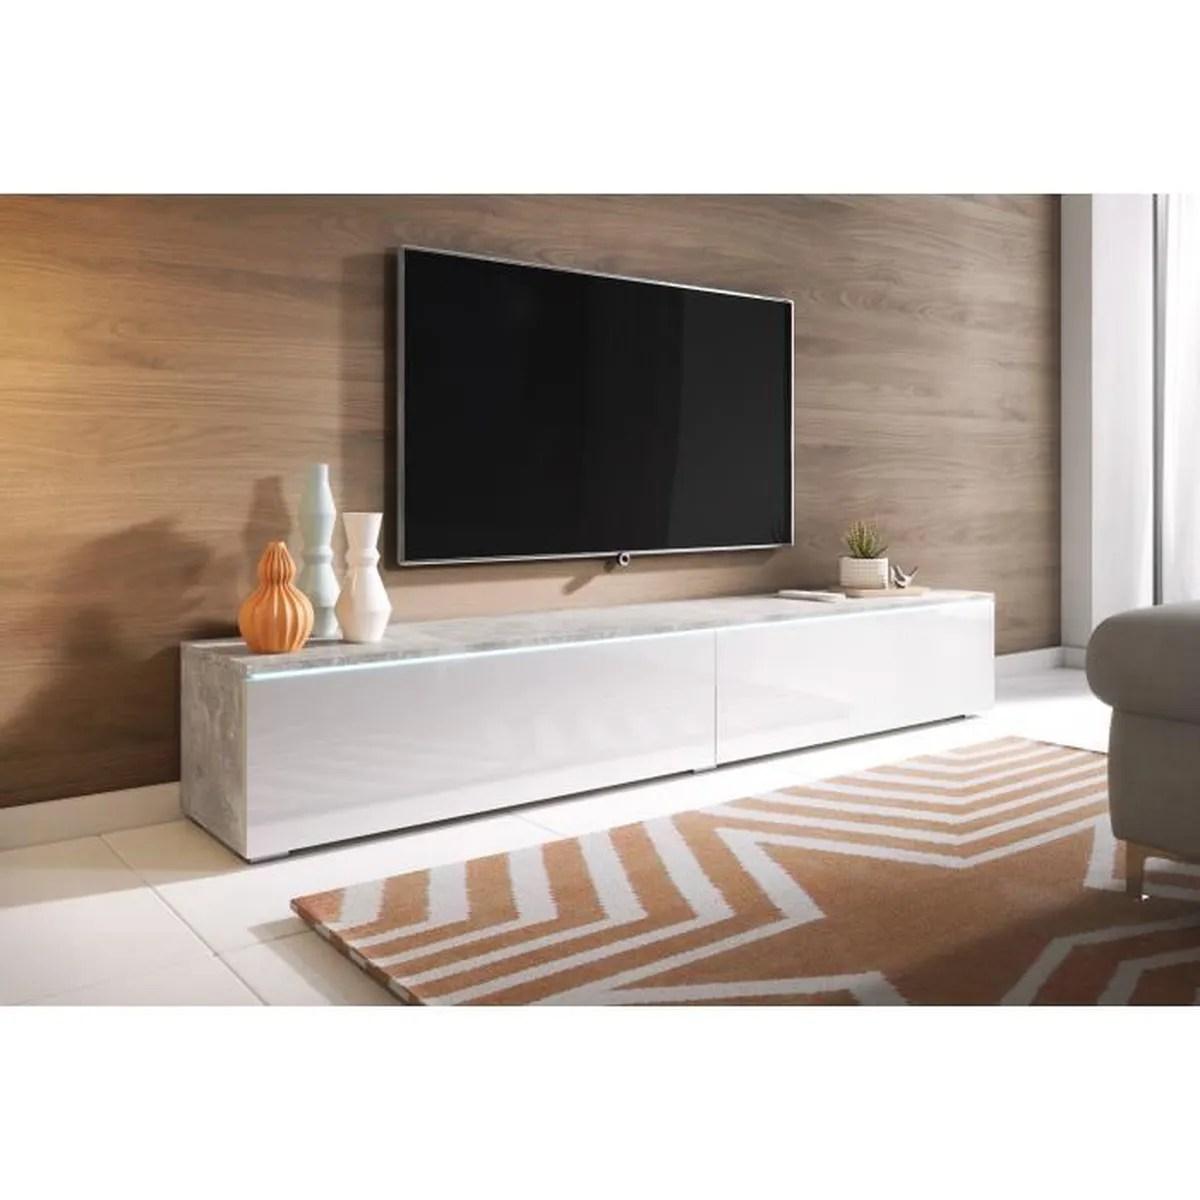 furnix prado double 200cm meuble tv